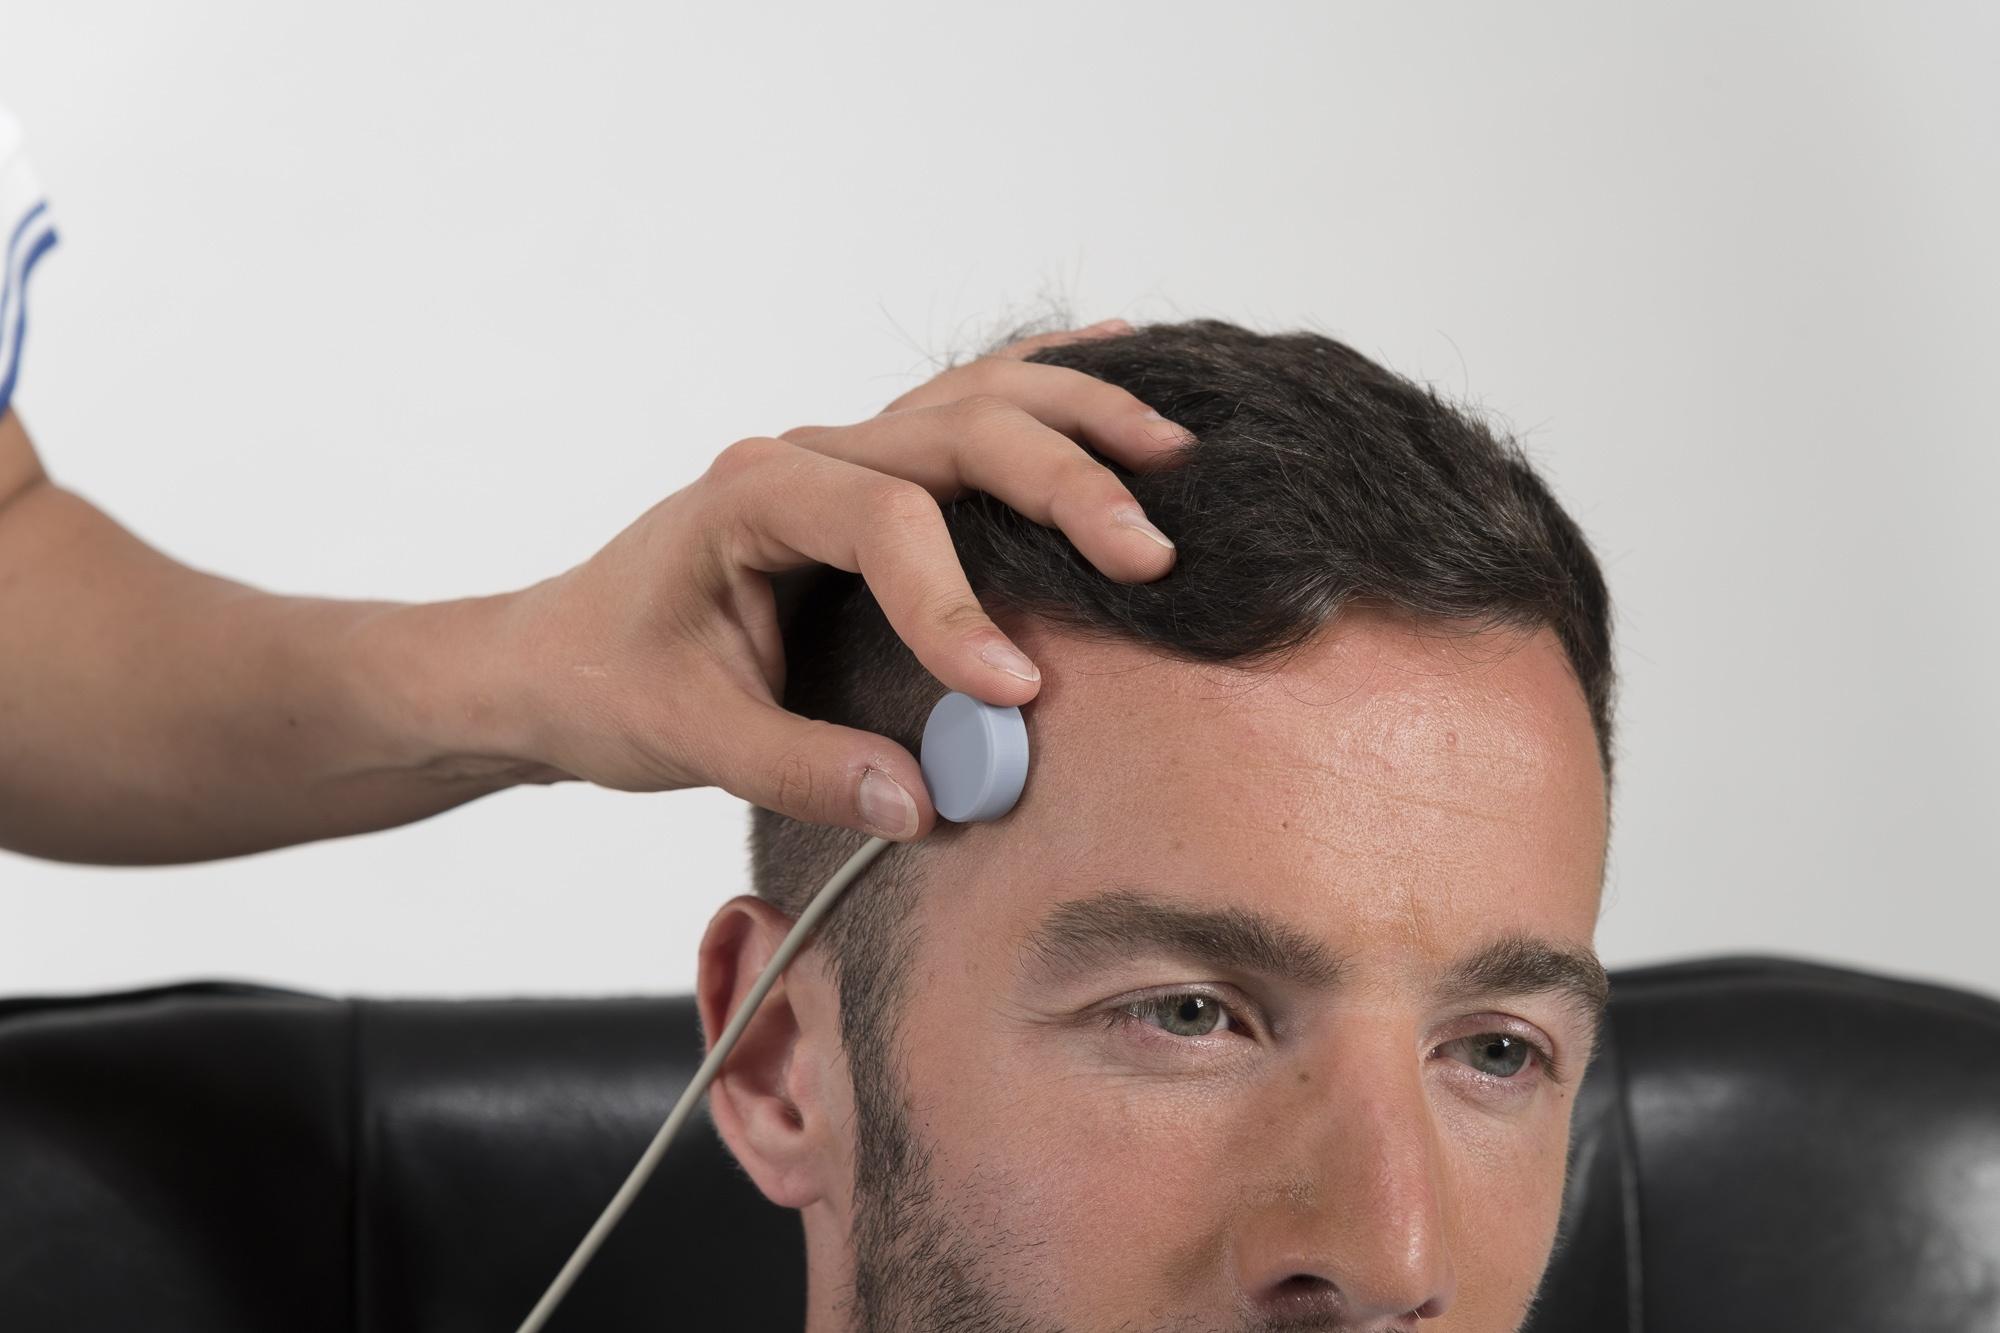 Anbringen des Vasosensors beim Migränetraining